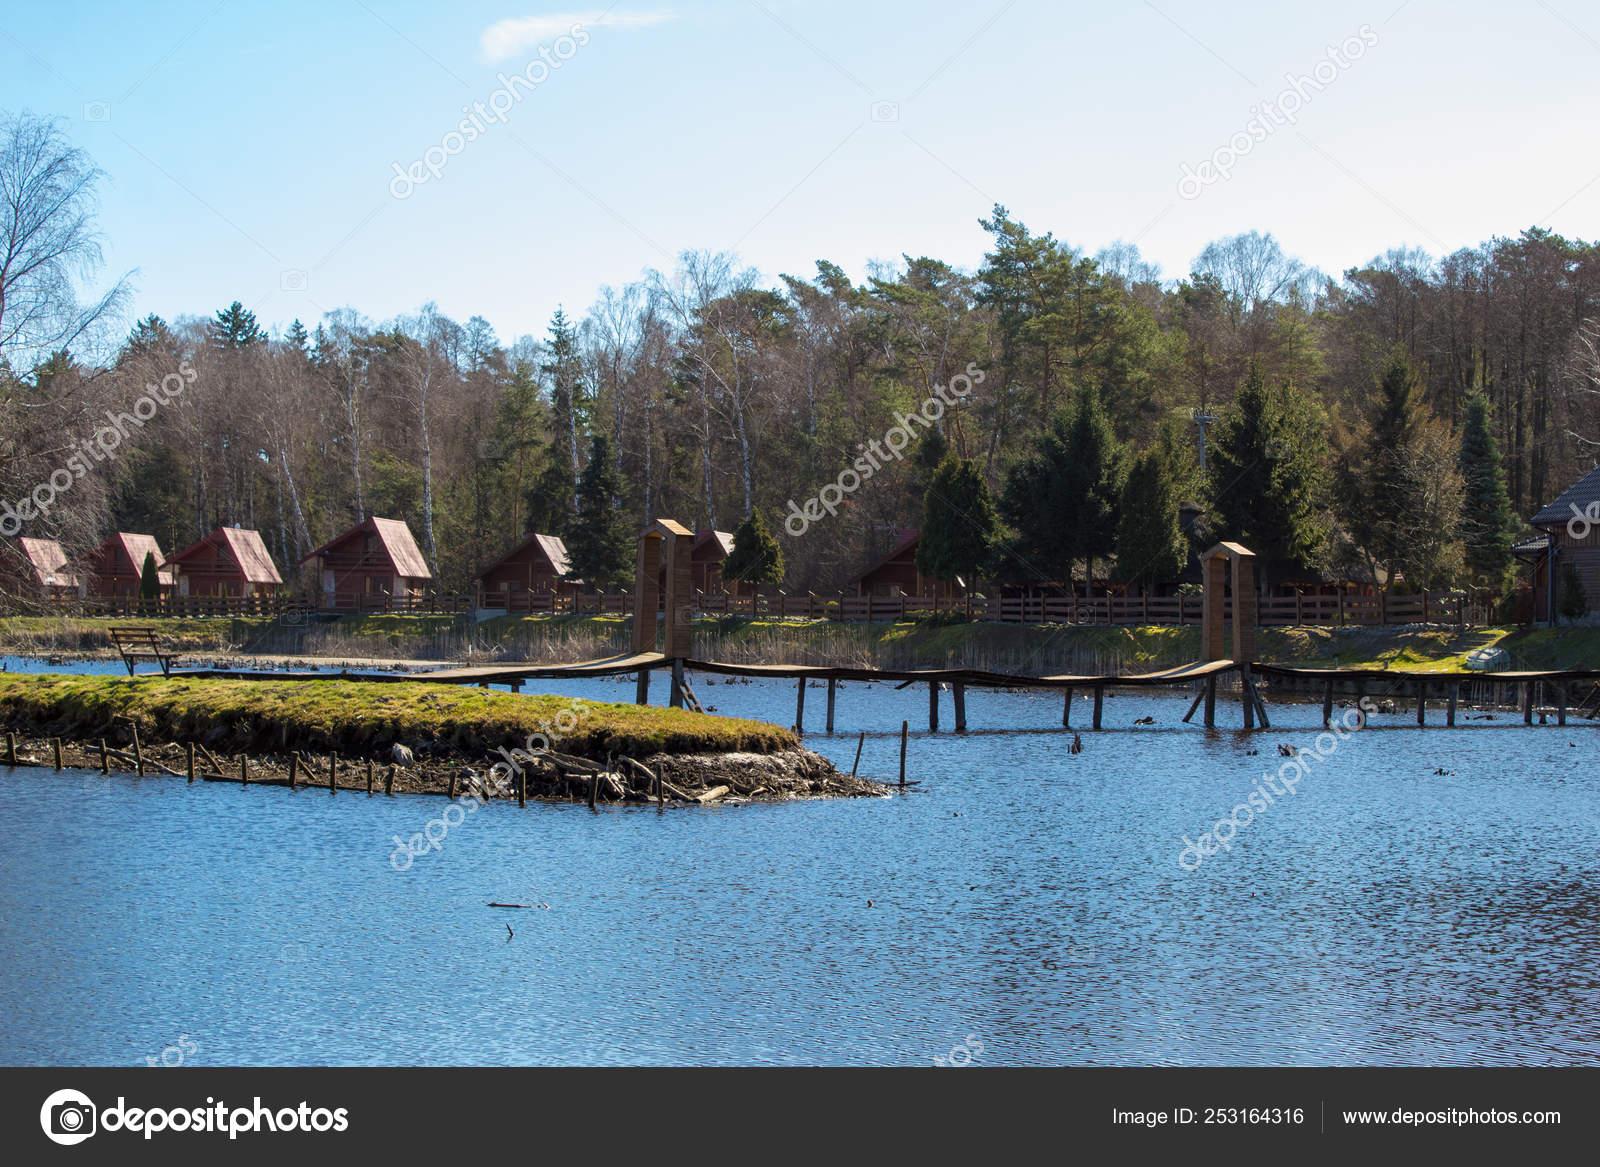 https://st4.depositphotos.com/22531124/25316/i/1600/depositphotos_253164316-stock-photo-beautiful-place-lake-pine-forest.jpg